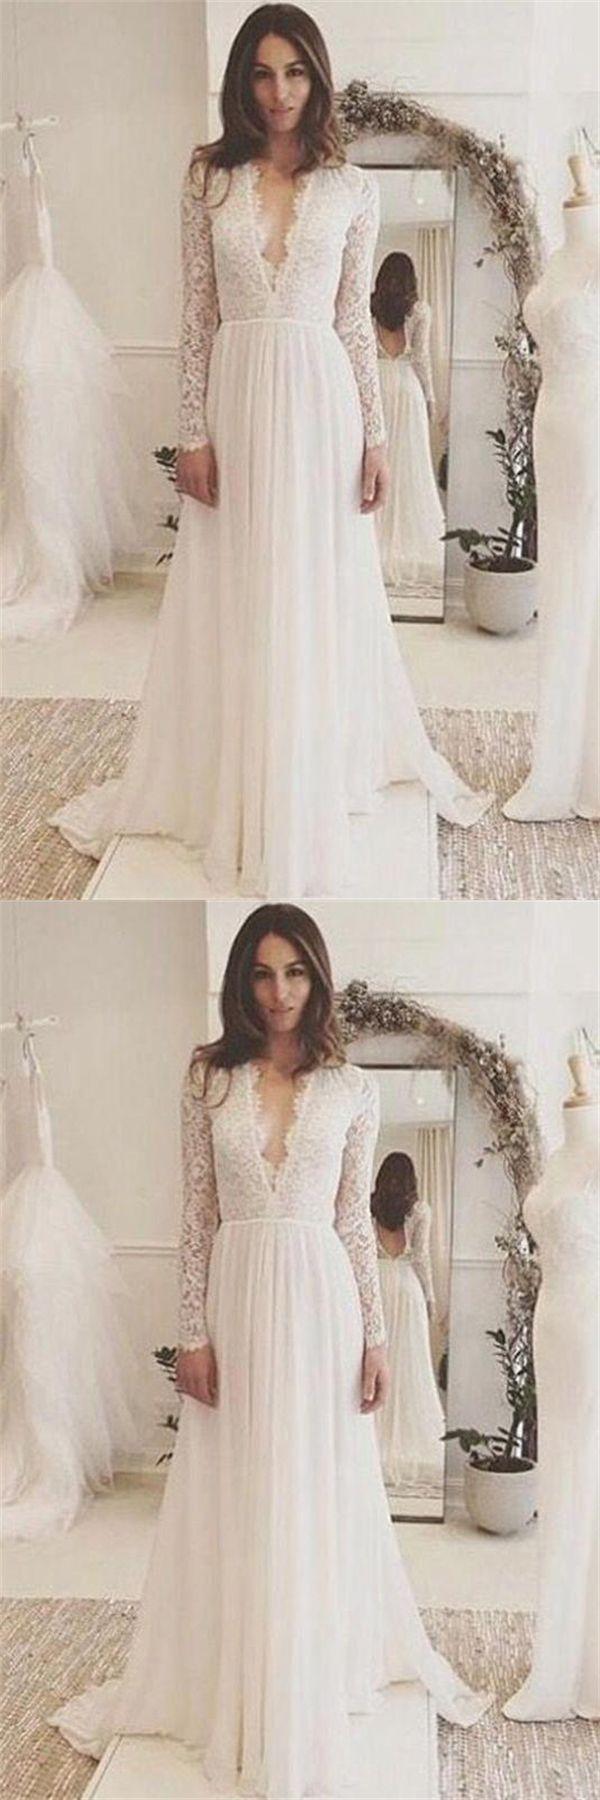 Ivory beach wedding dresses  Classy Deep Vneck Long Sleeves Ivory Lace Chiffon Beach Wedding